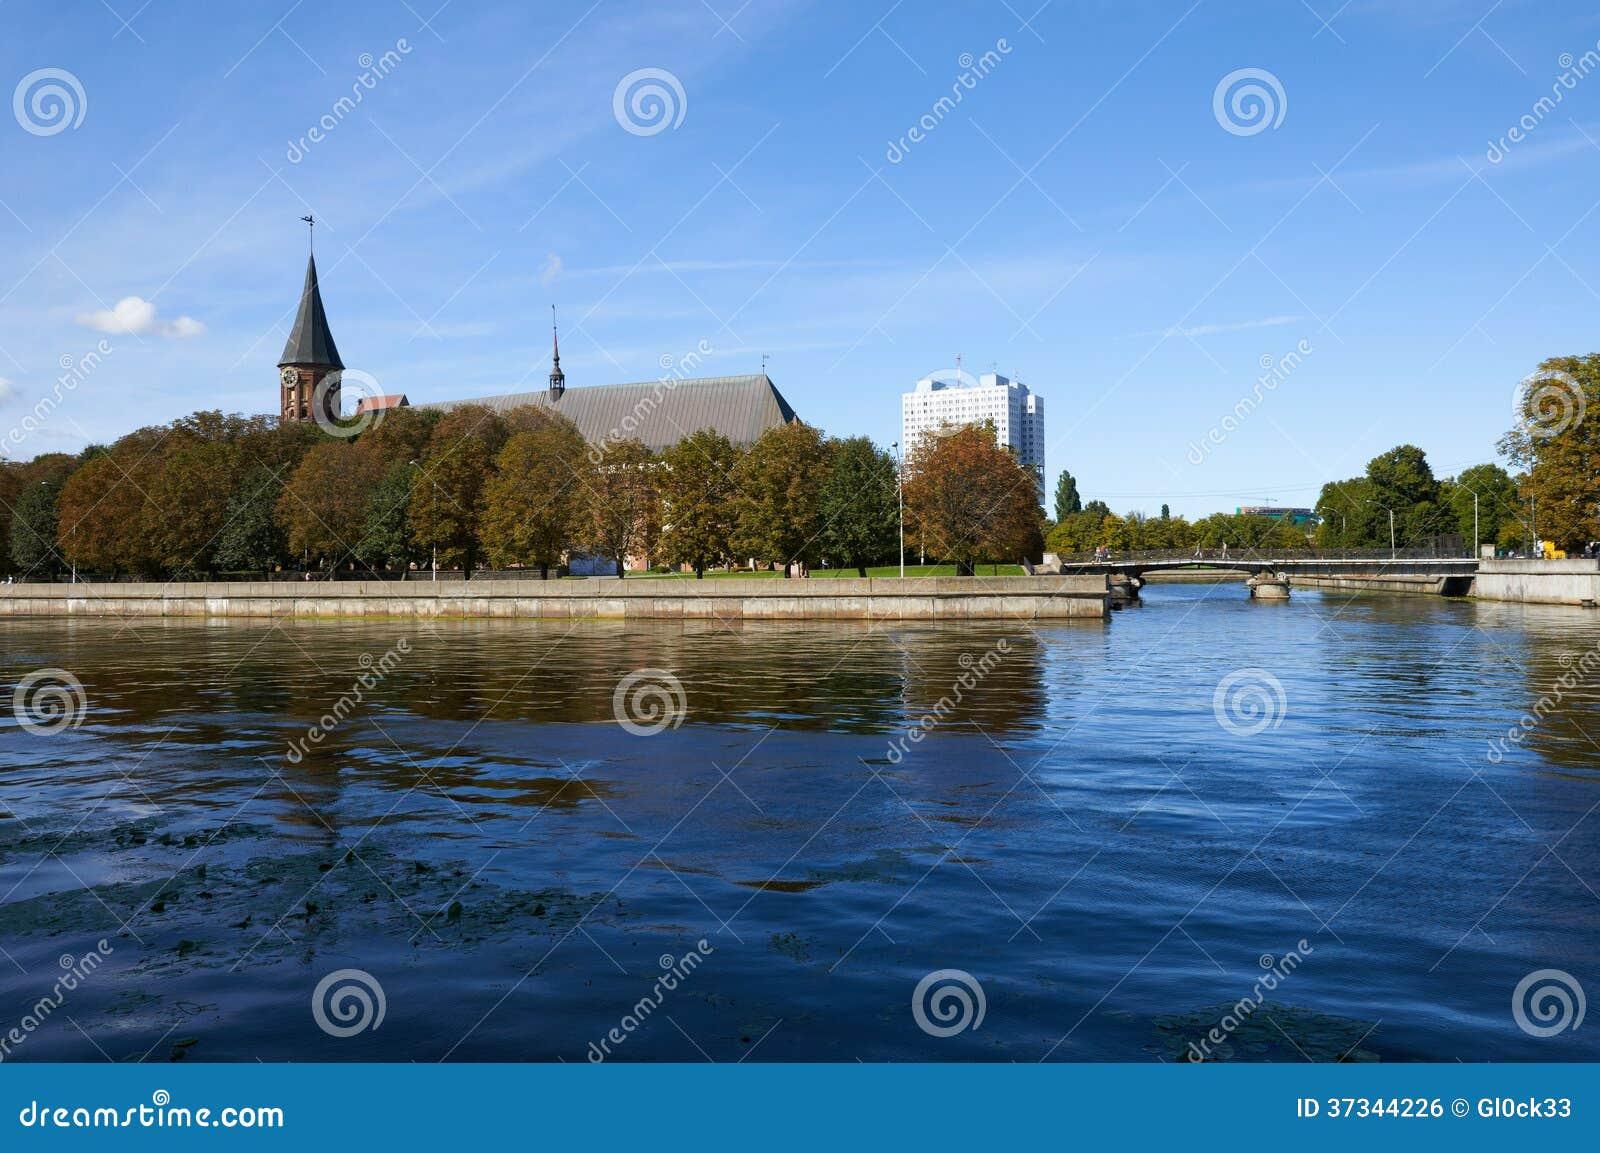 Kenigsberg Cathedral. Kaliningrad. Russia